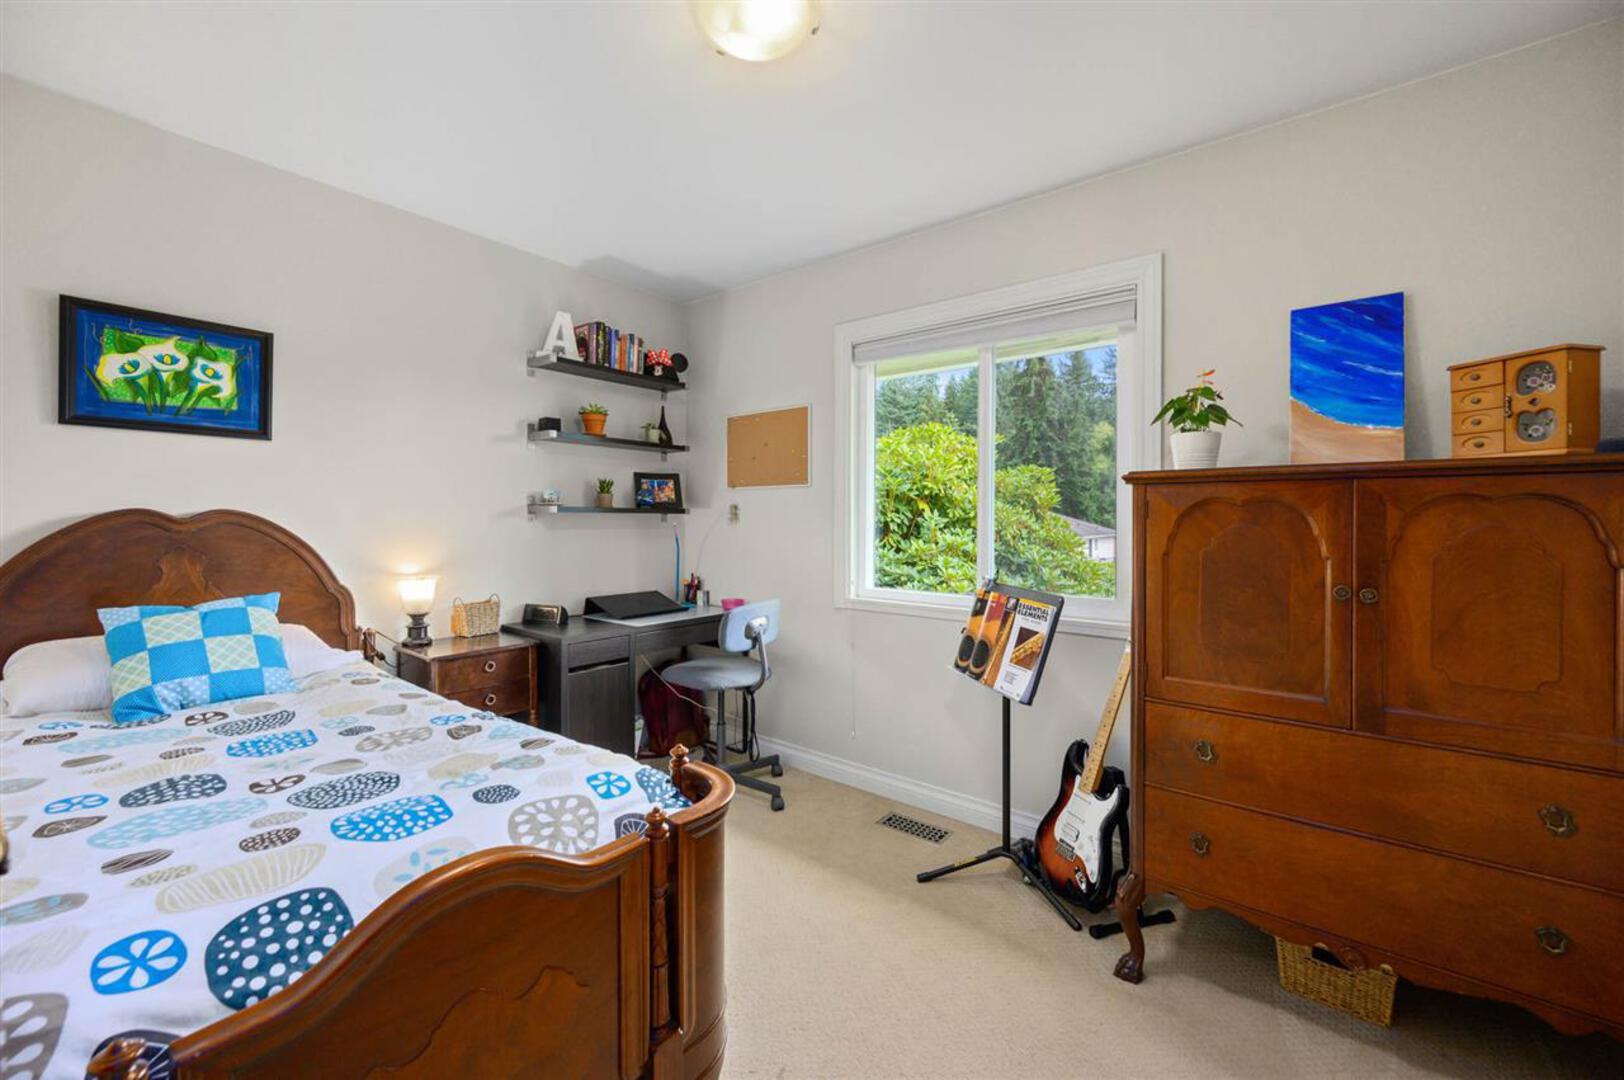 2808-trillium-place-blueridge-nv-north-vancouver-23 at 2808 Trillium Place, Blueridge NV, North Vancouver